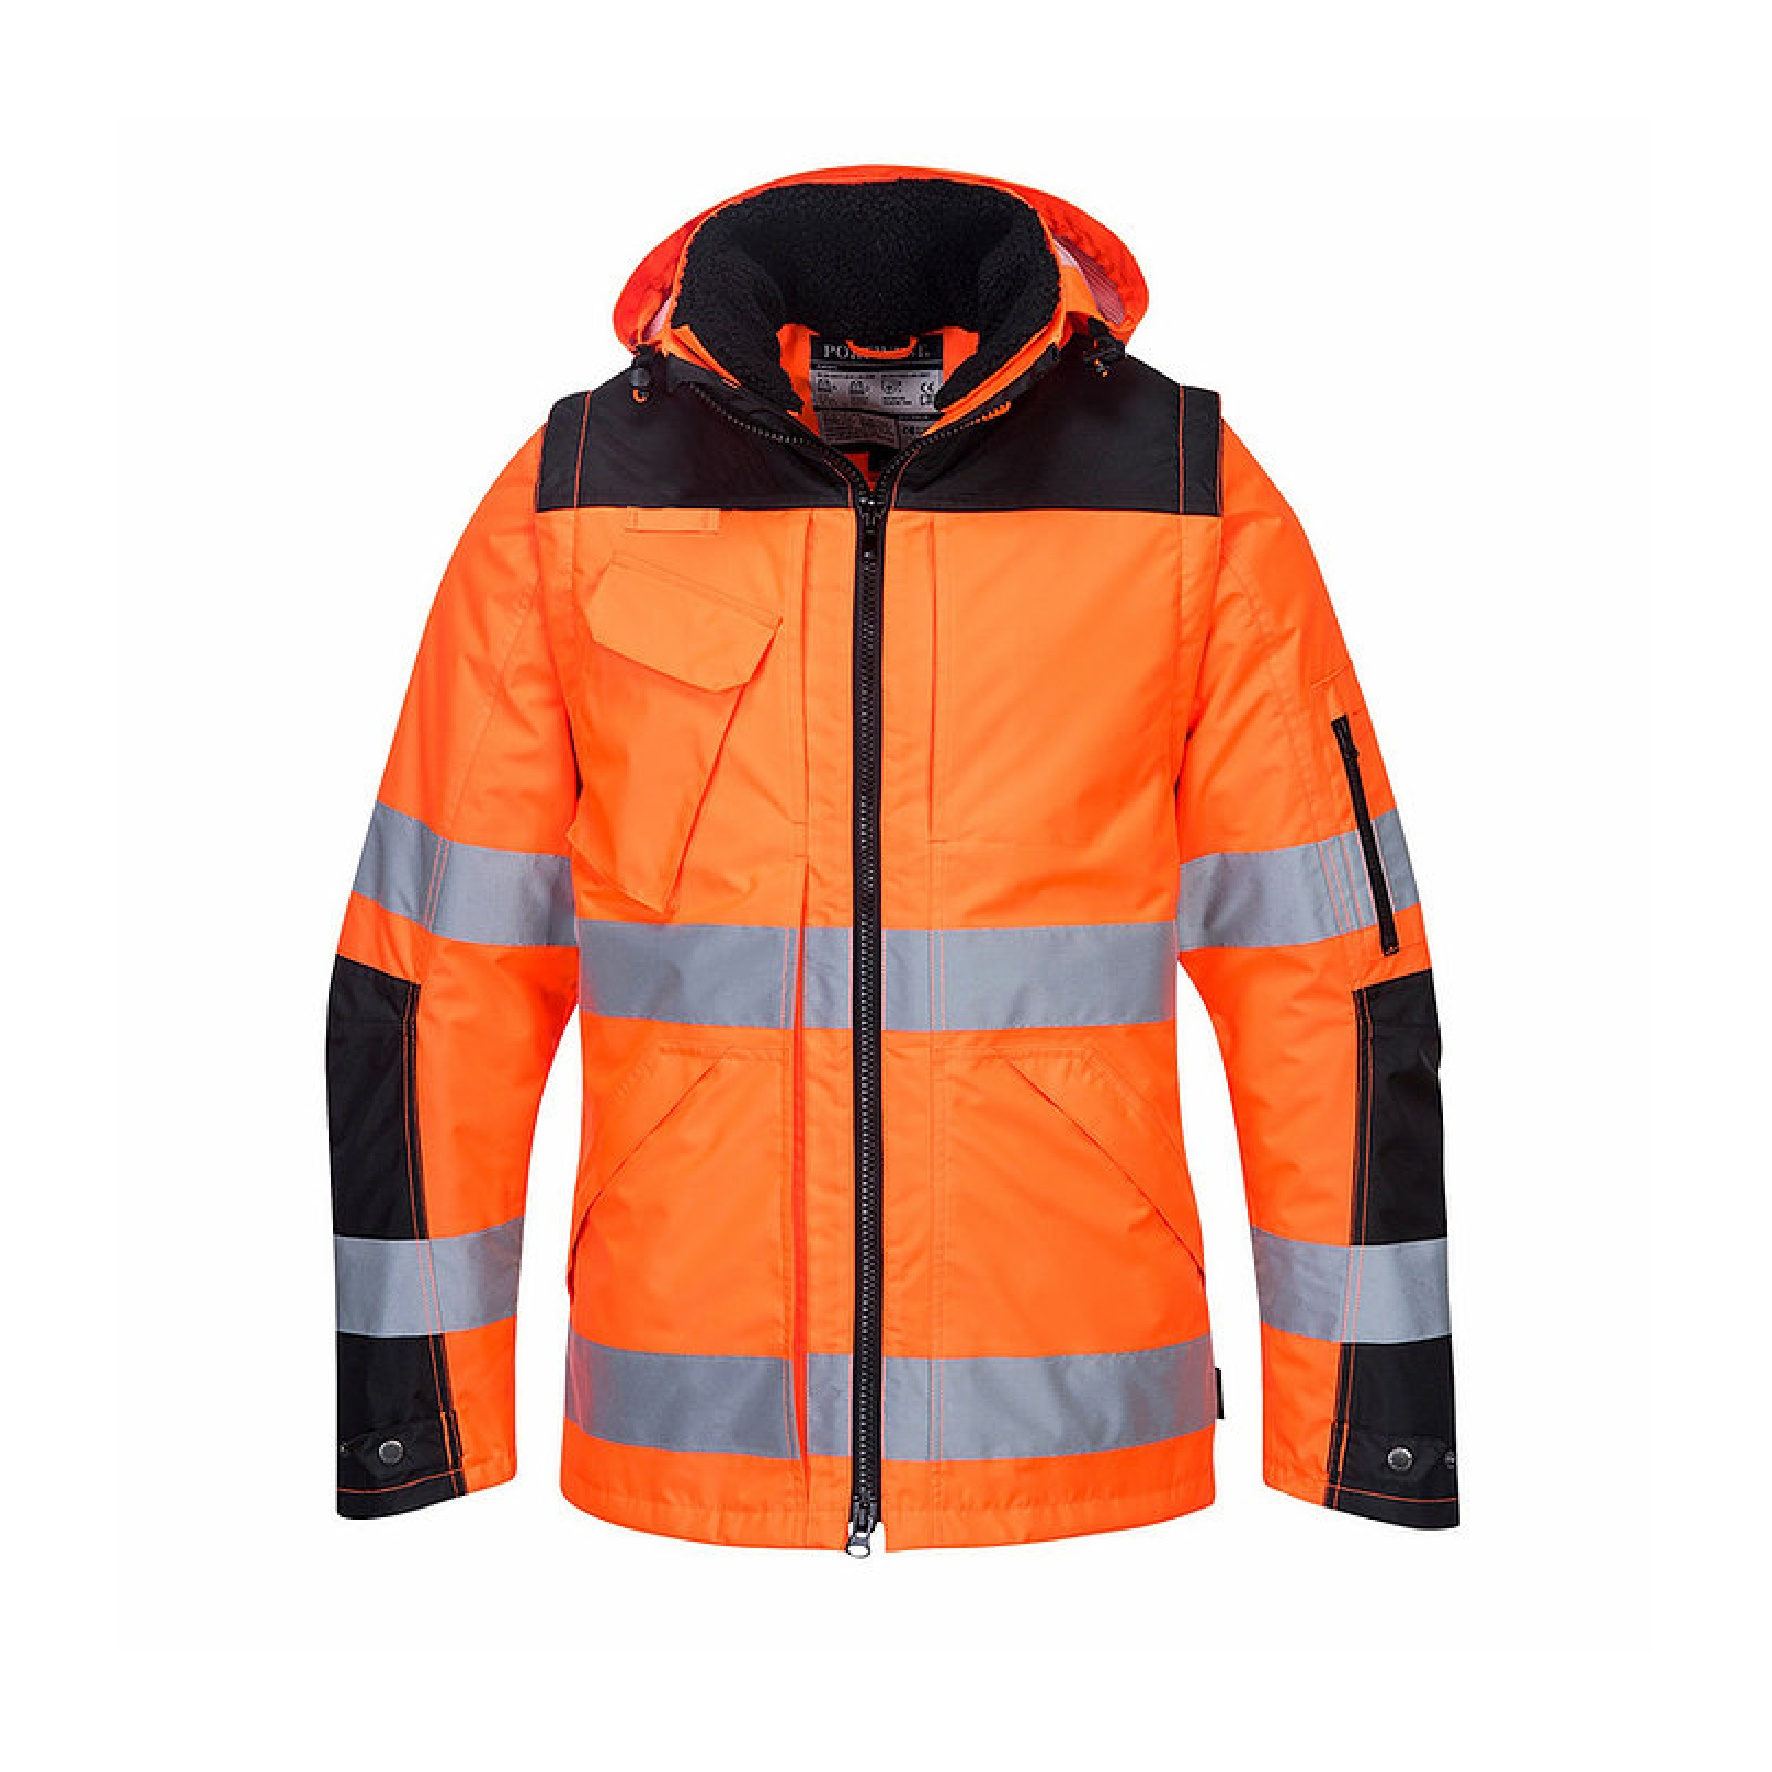 Redrok Workwear Centre Plymouth - Portwest - Pro Hi-Vis 3-in-1 Jacket